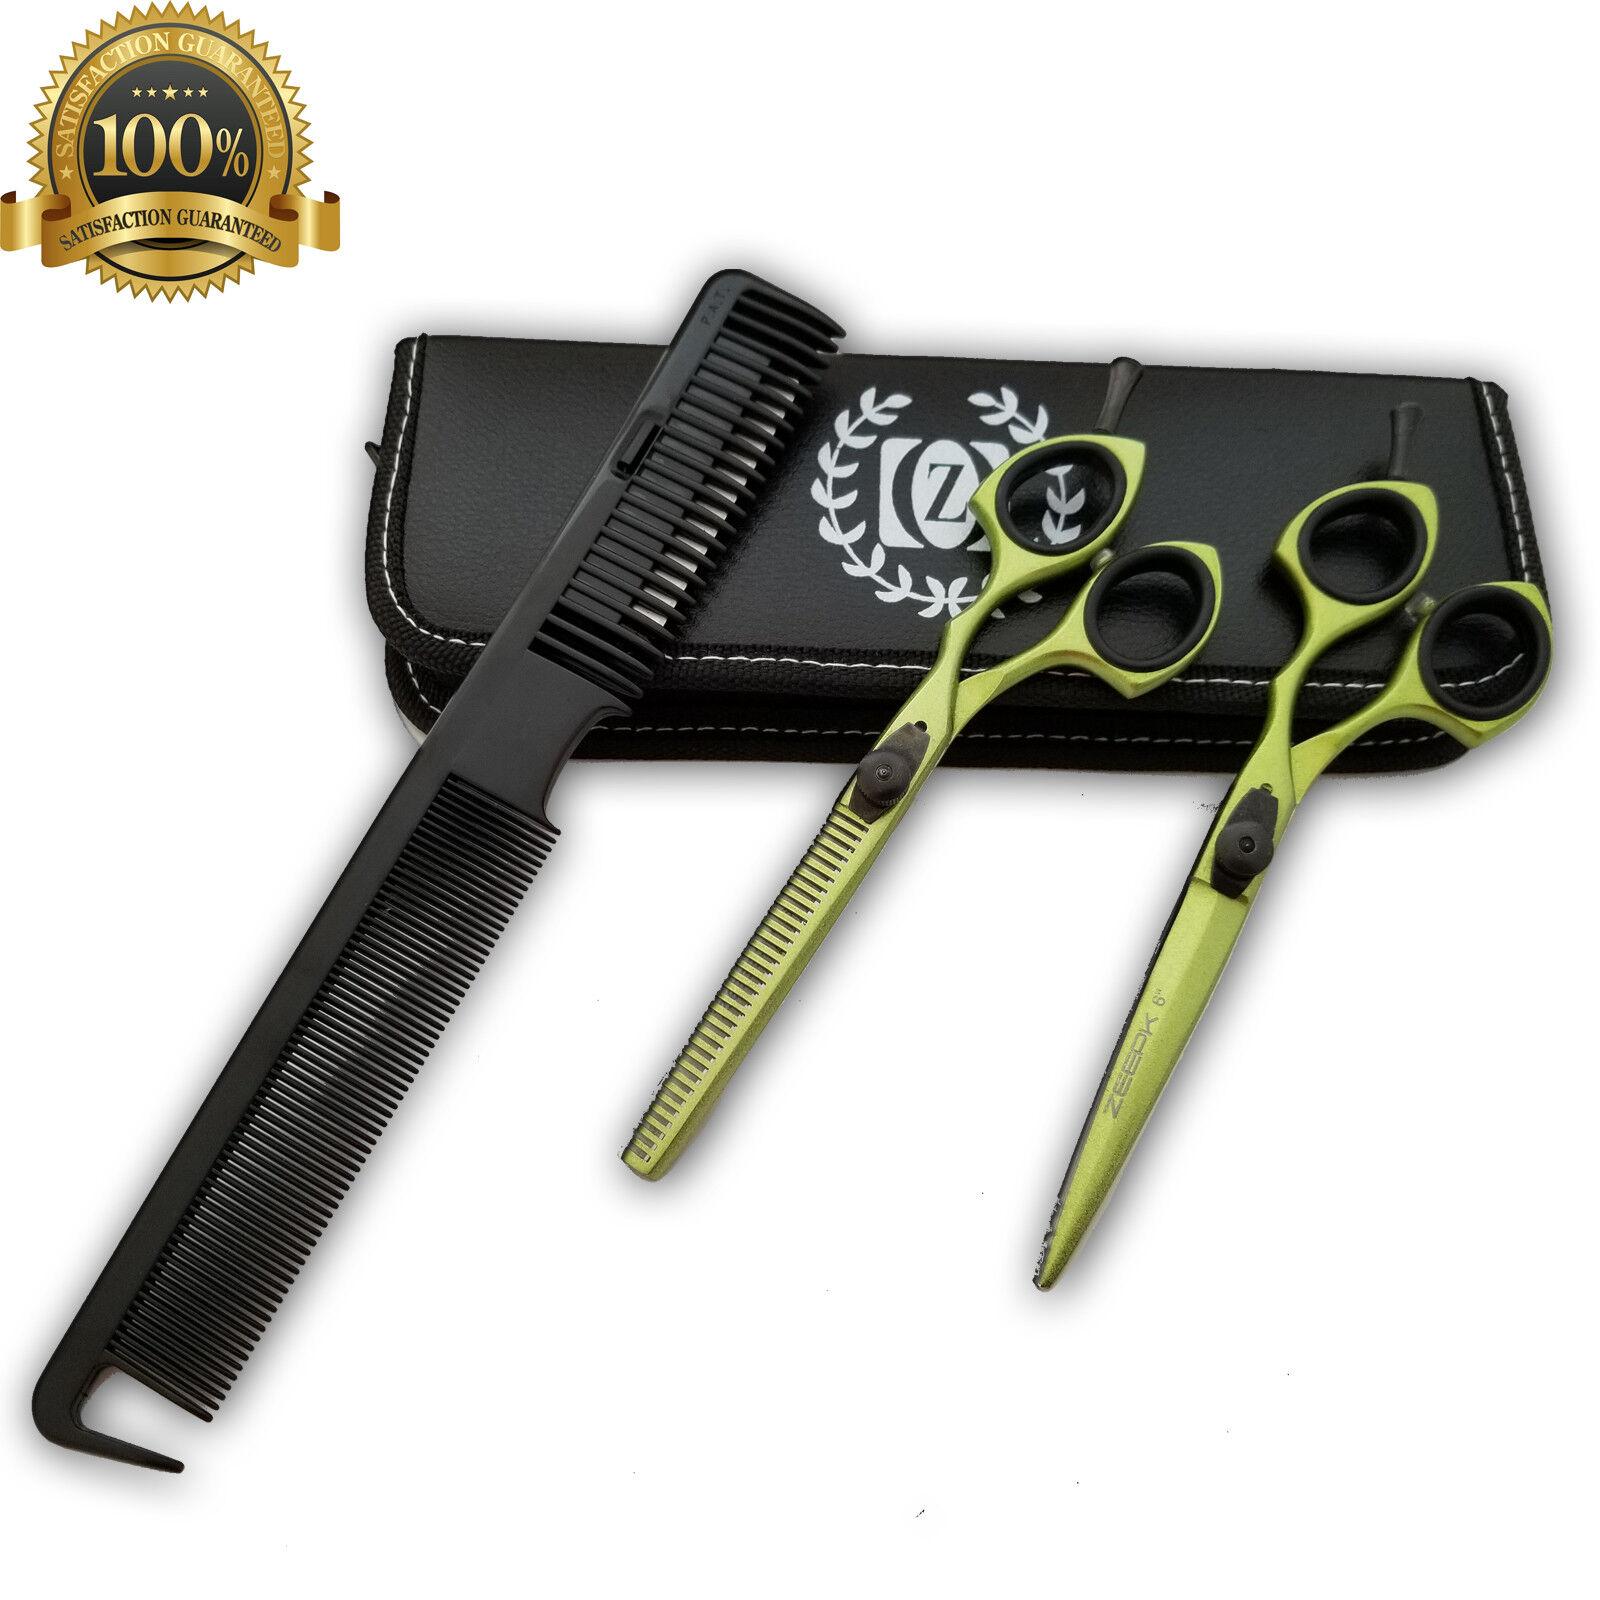 "5.5"" Professional Japanese Scissors Shears for Superior Hair"